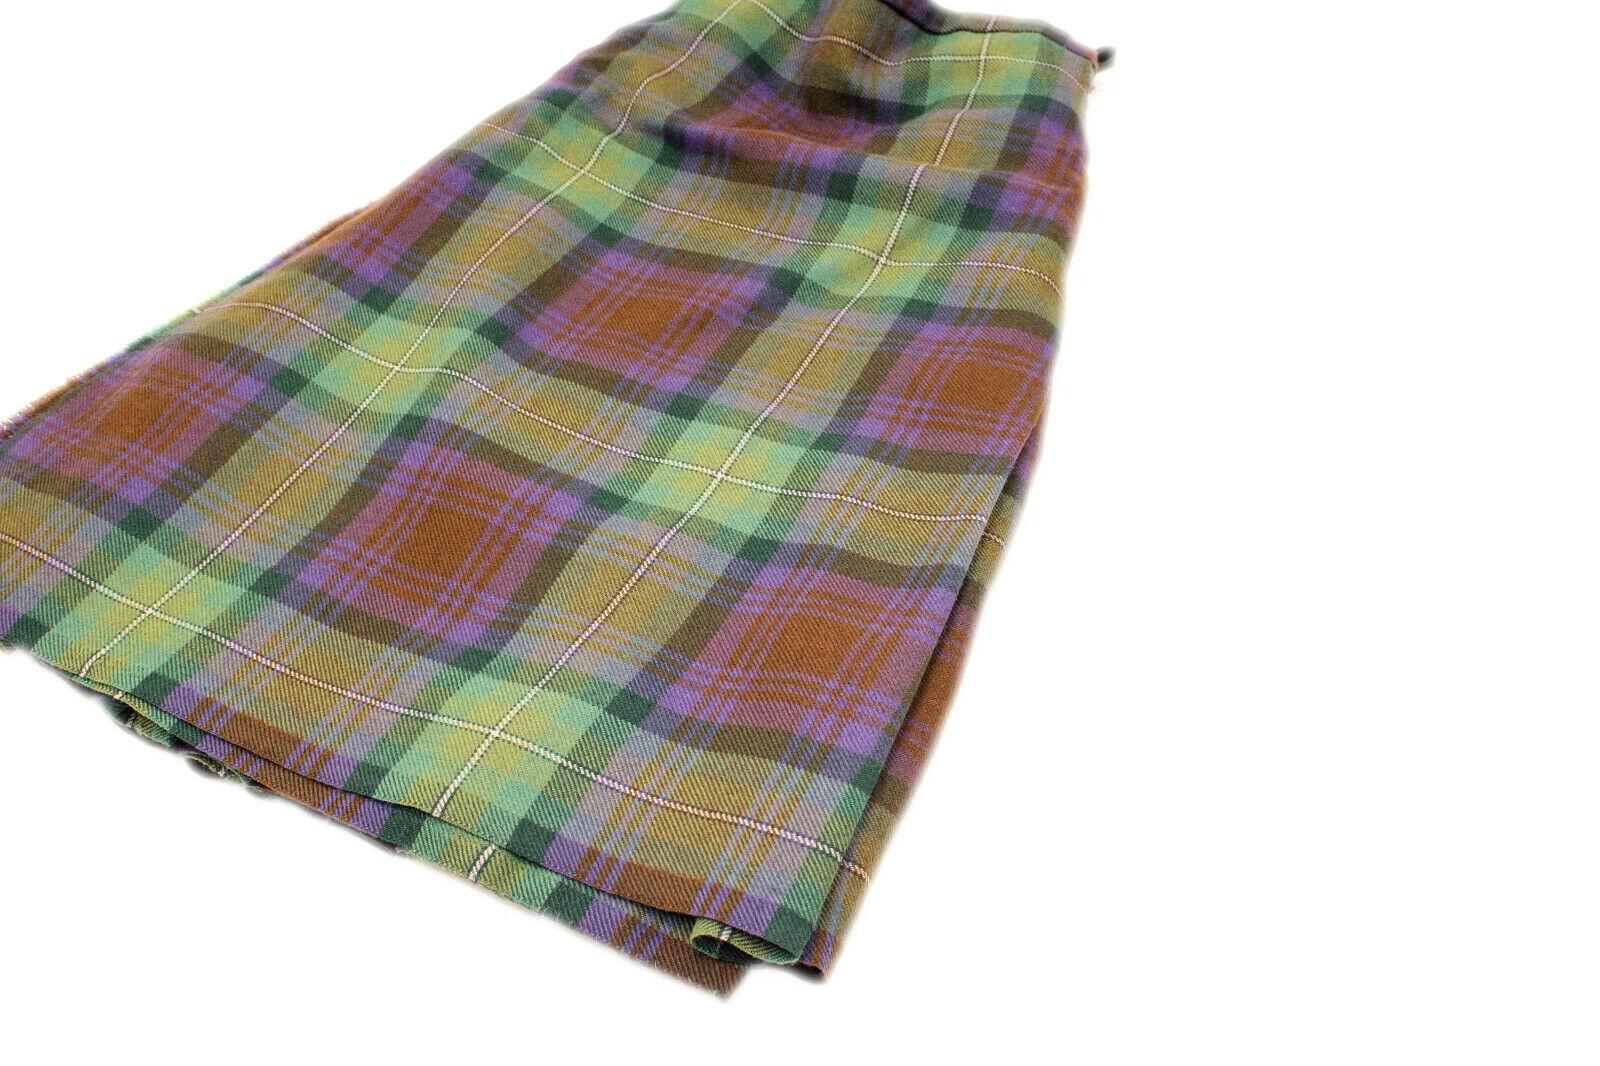 Isle of SKye 5 Yard 100% Wool Kilt Made in Scotland 26/23 & 26/26 only